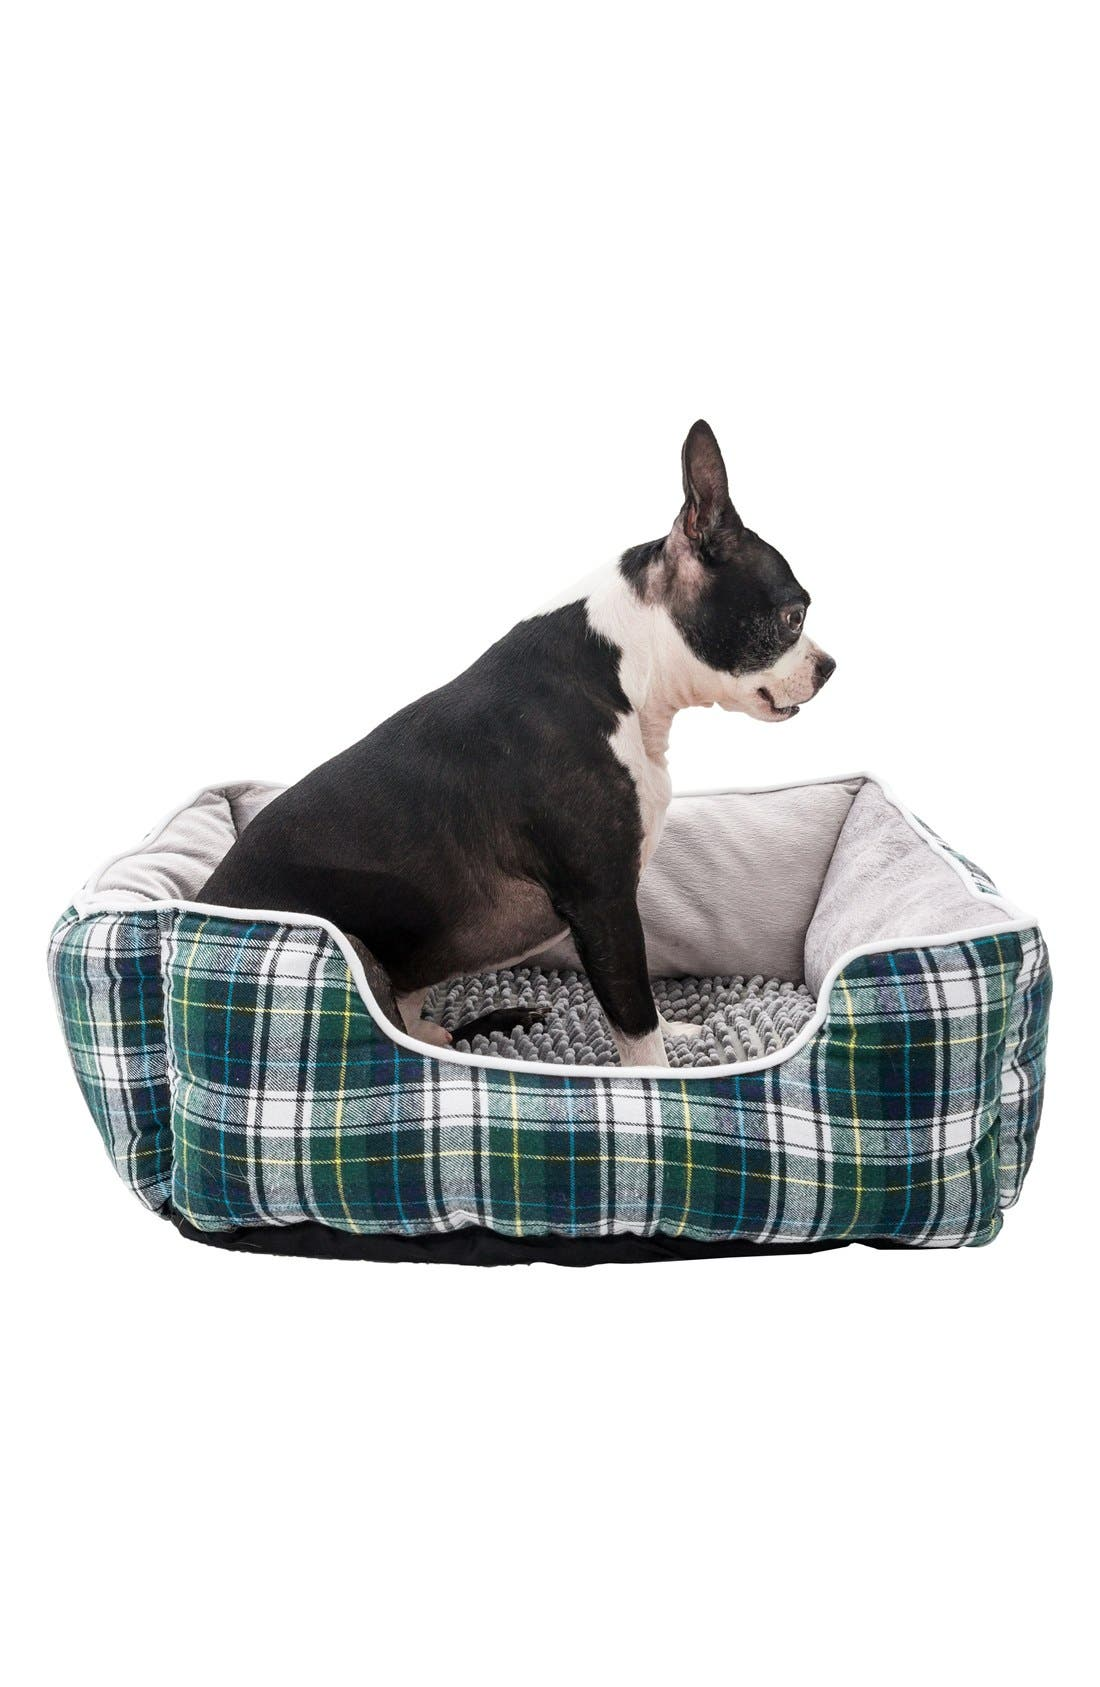 Braxton Plaid Pet Bed,                             Main thumbnail 1, color,                             020